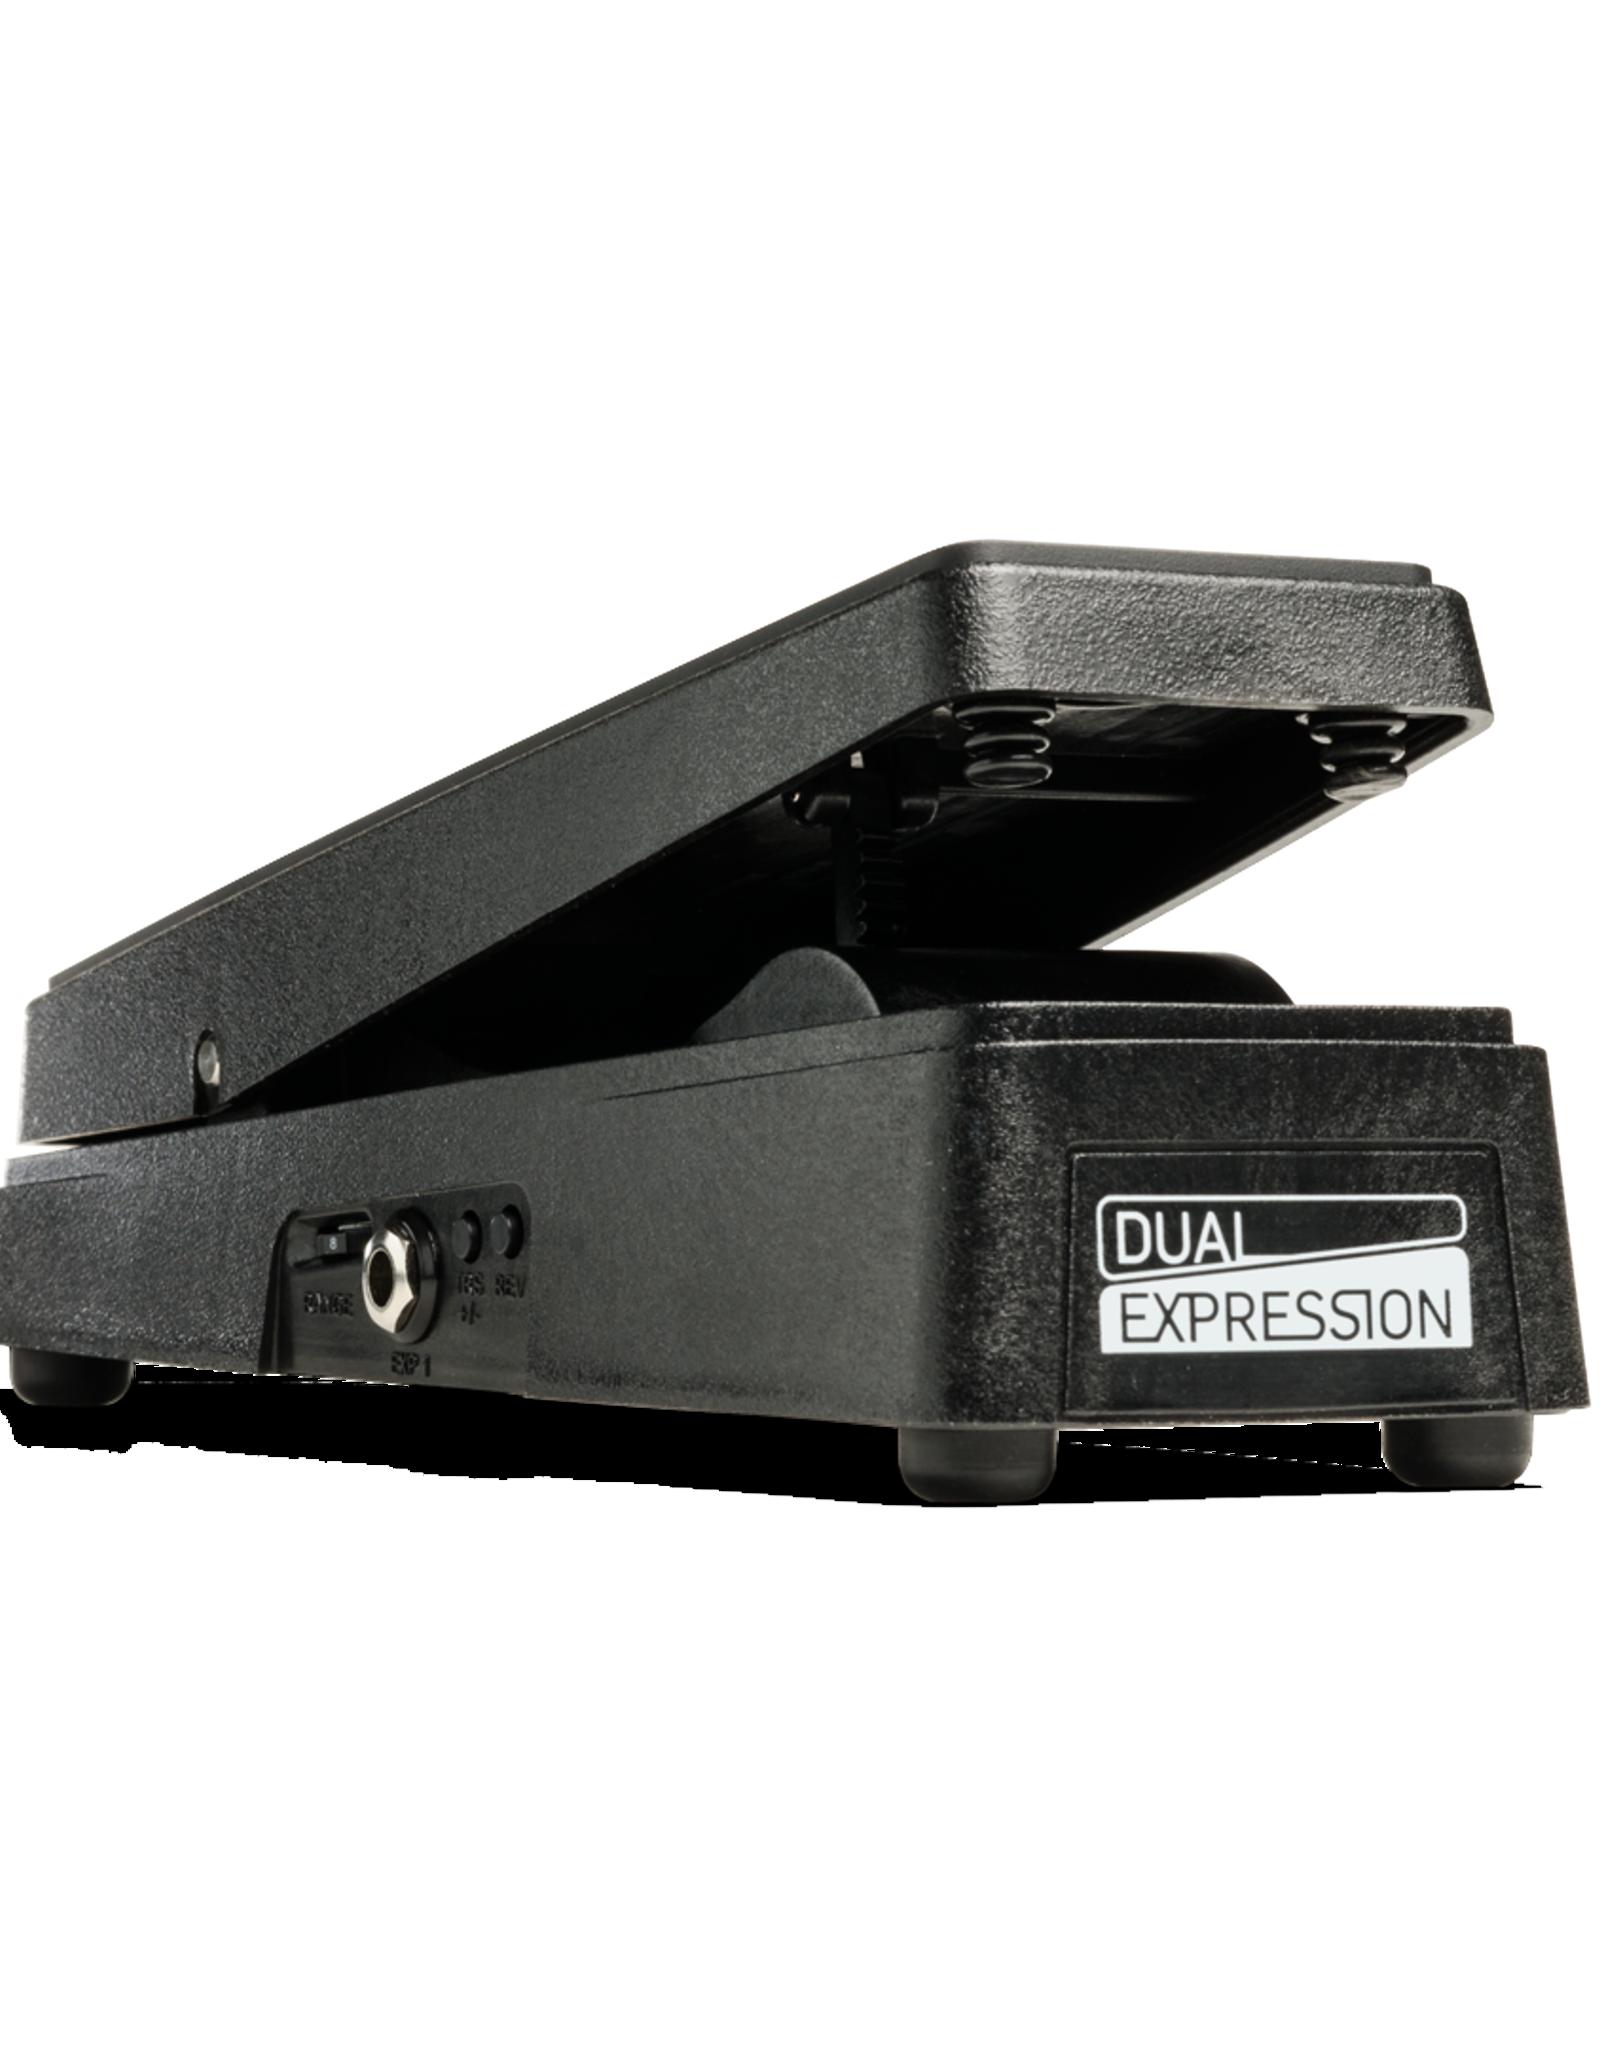 Electro-Harmonix EHX DUAL EXPRESSION Dual-output EXP control, 9.6DC-200 PSU optional